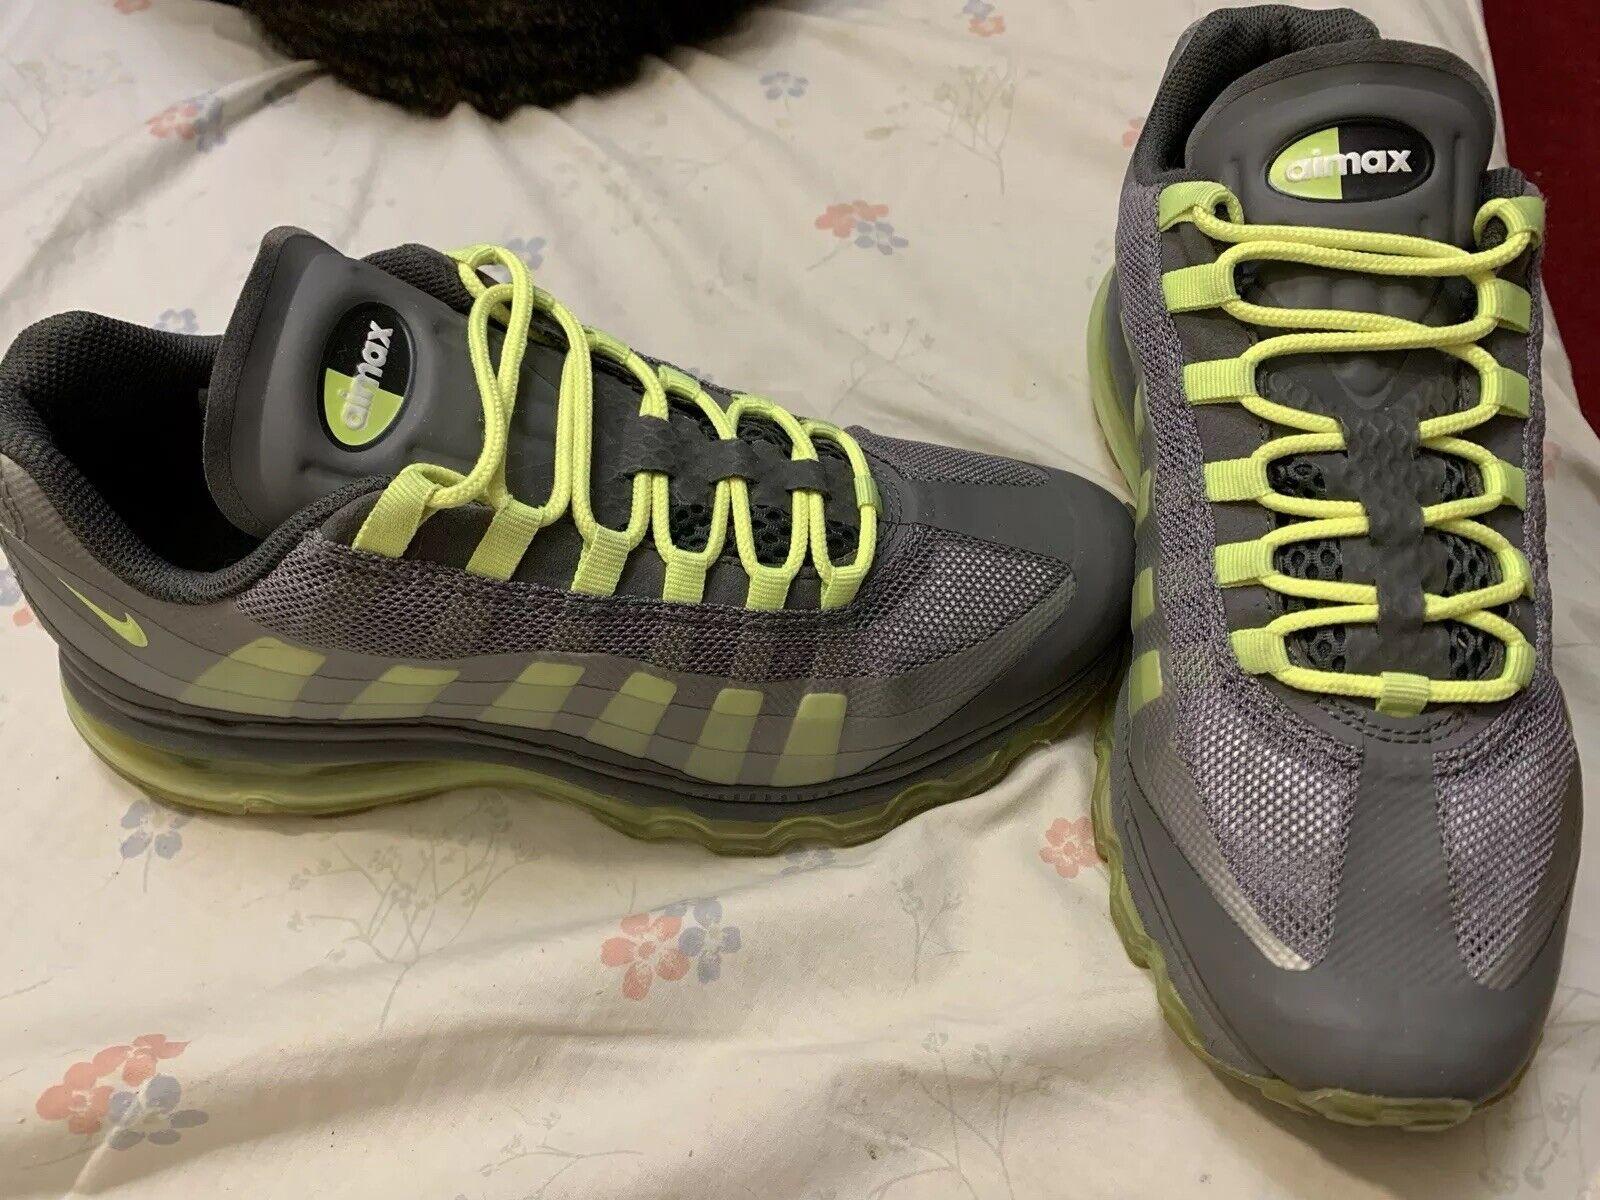 Nike Air Max 95 360 GS Big Kids 512169 003 Grey Volt Running Shoes. Sz 7Y..2012